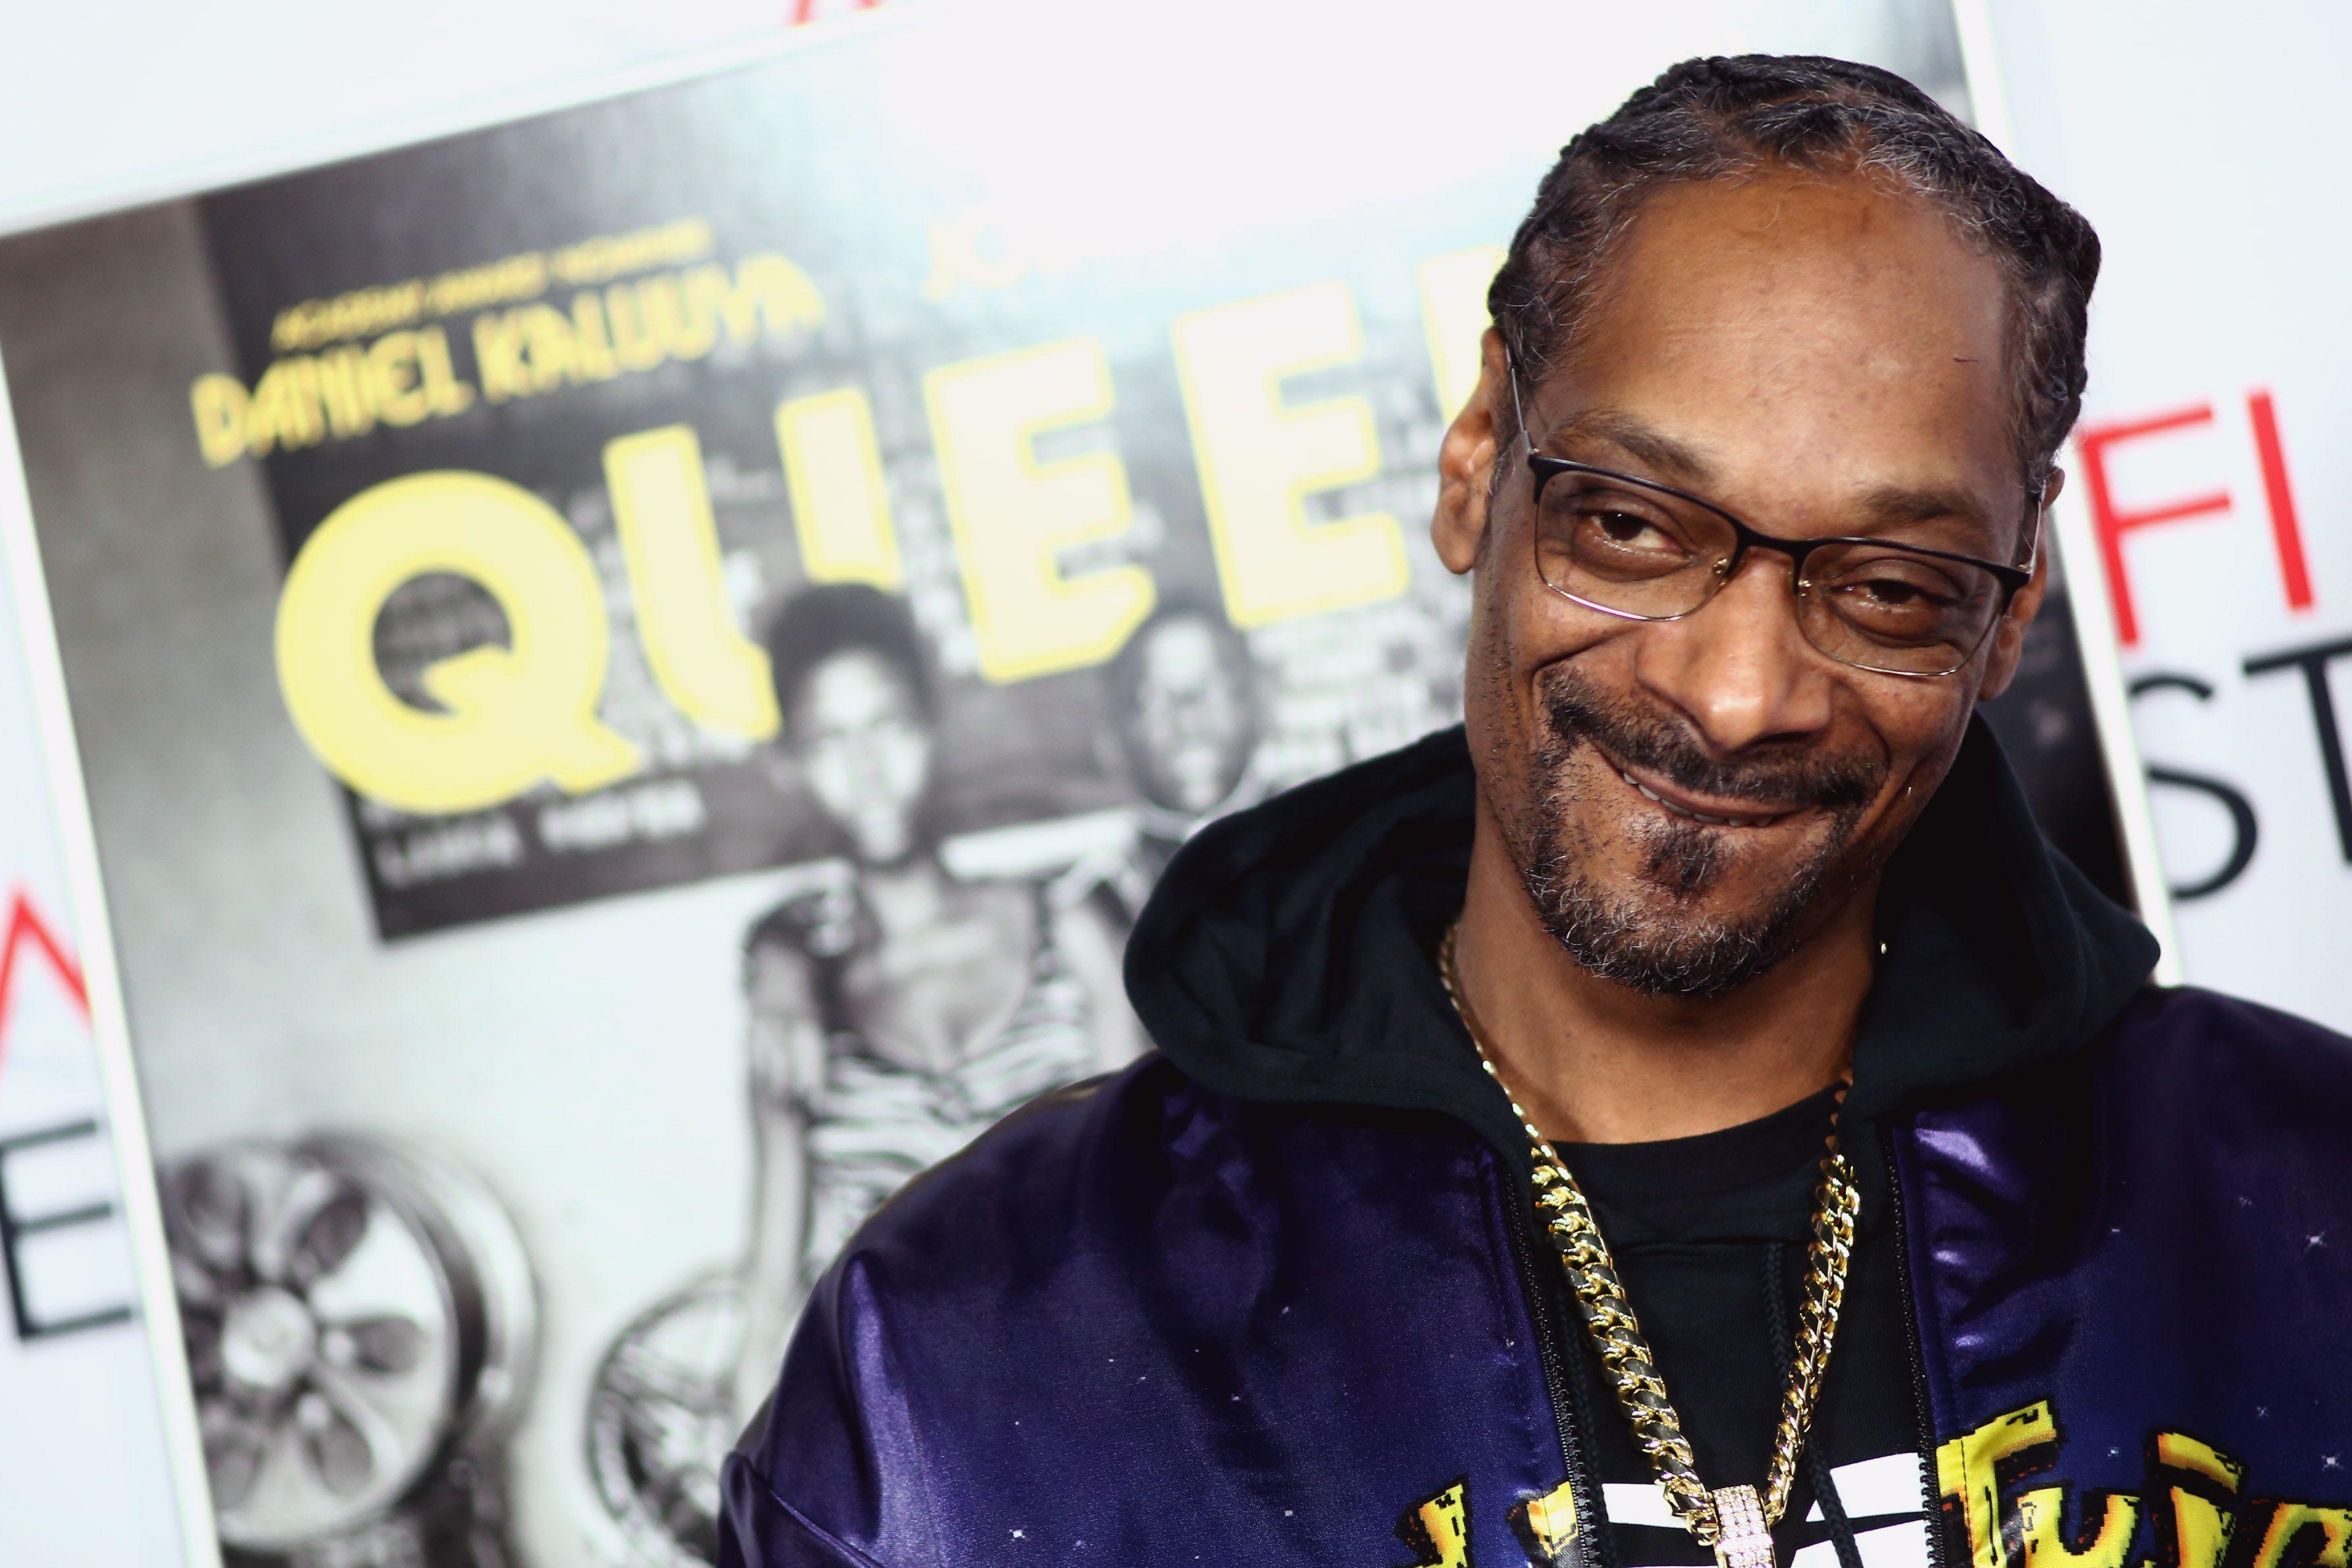 Snoop Dogg headshot, smiling.